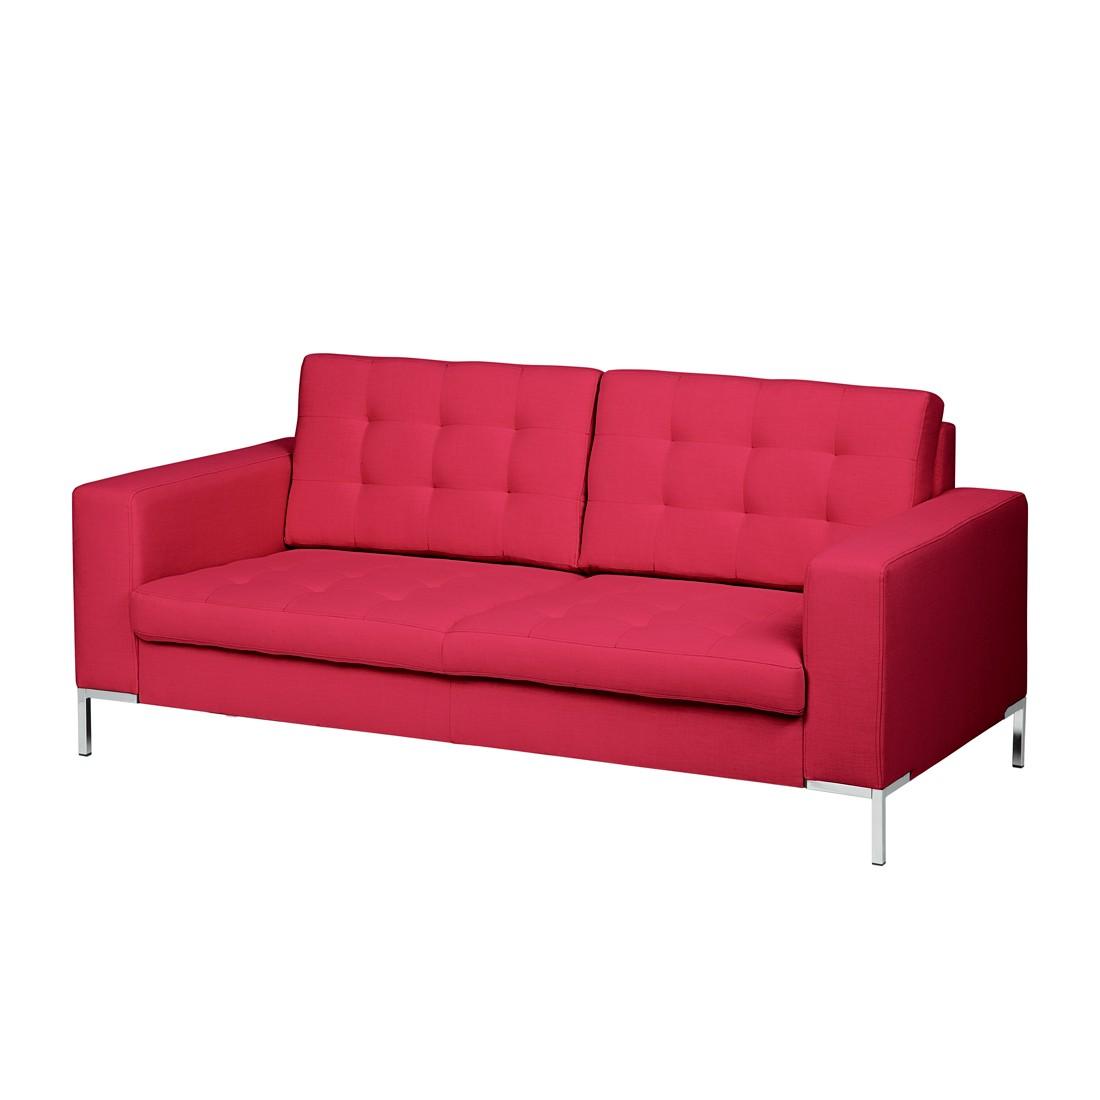 Sofa Nistra (2-Sitzer) – Stoff Pink, Fredriks günstig